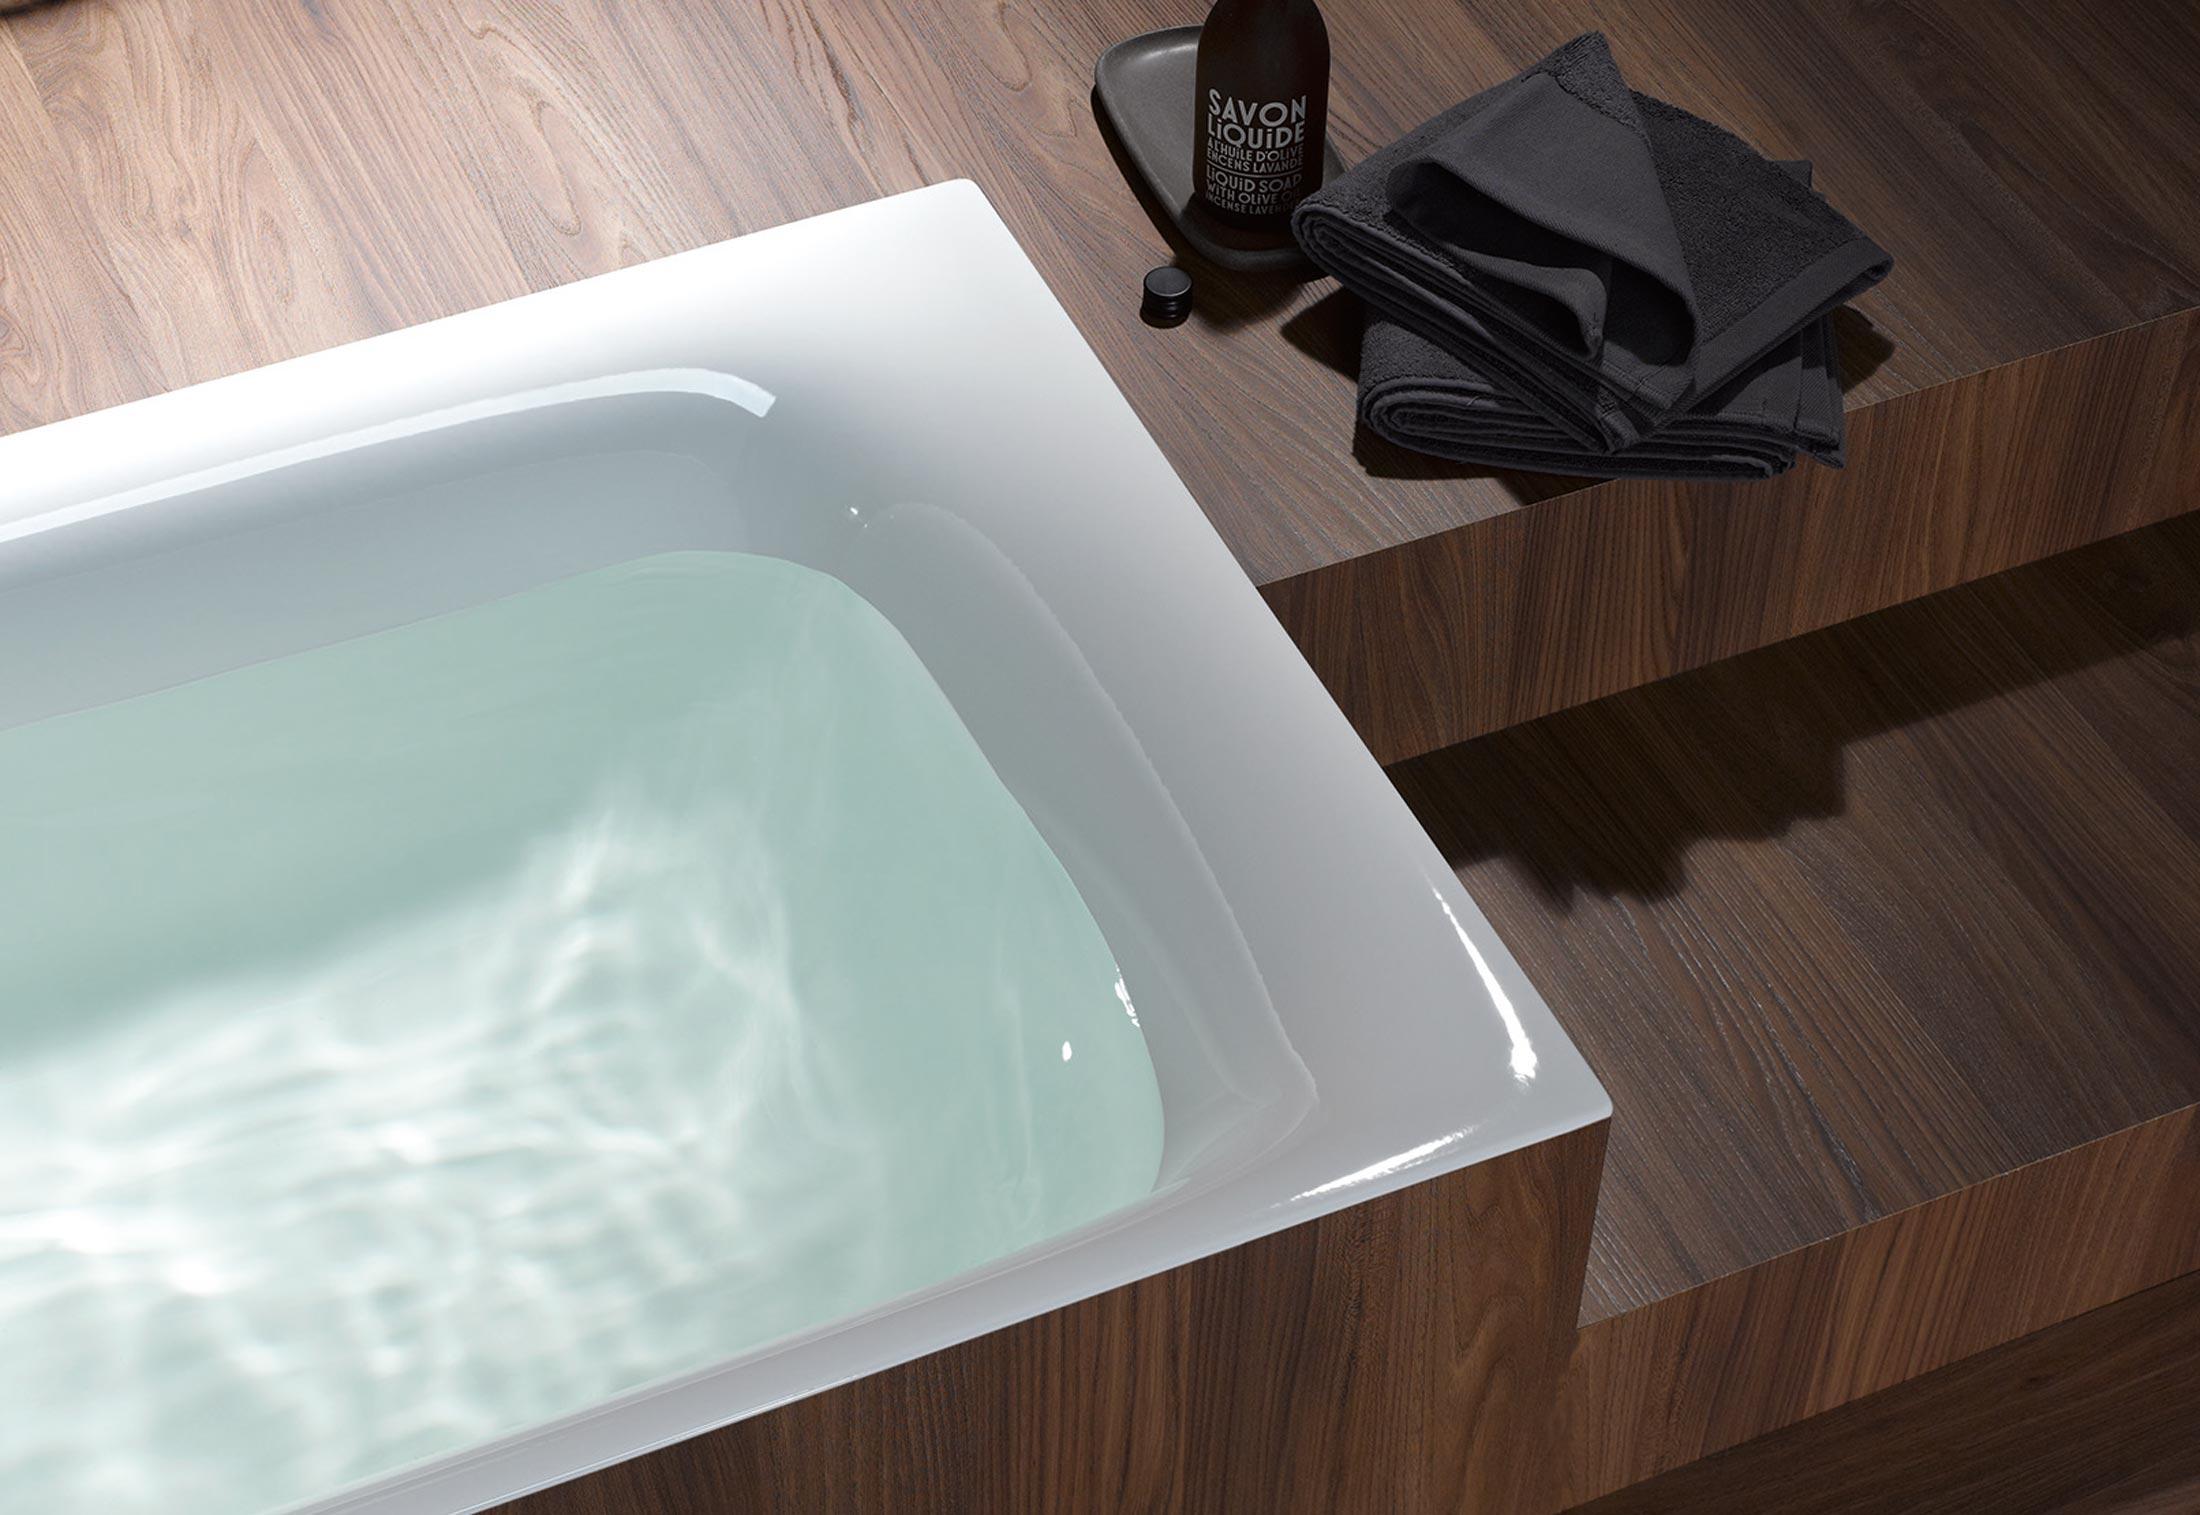 BETTELUX bathtub by Bette | STYLEPARK